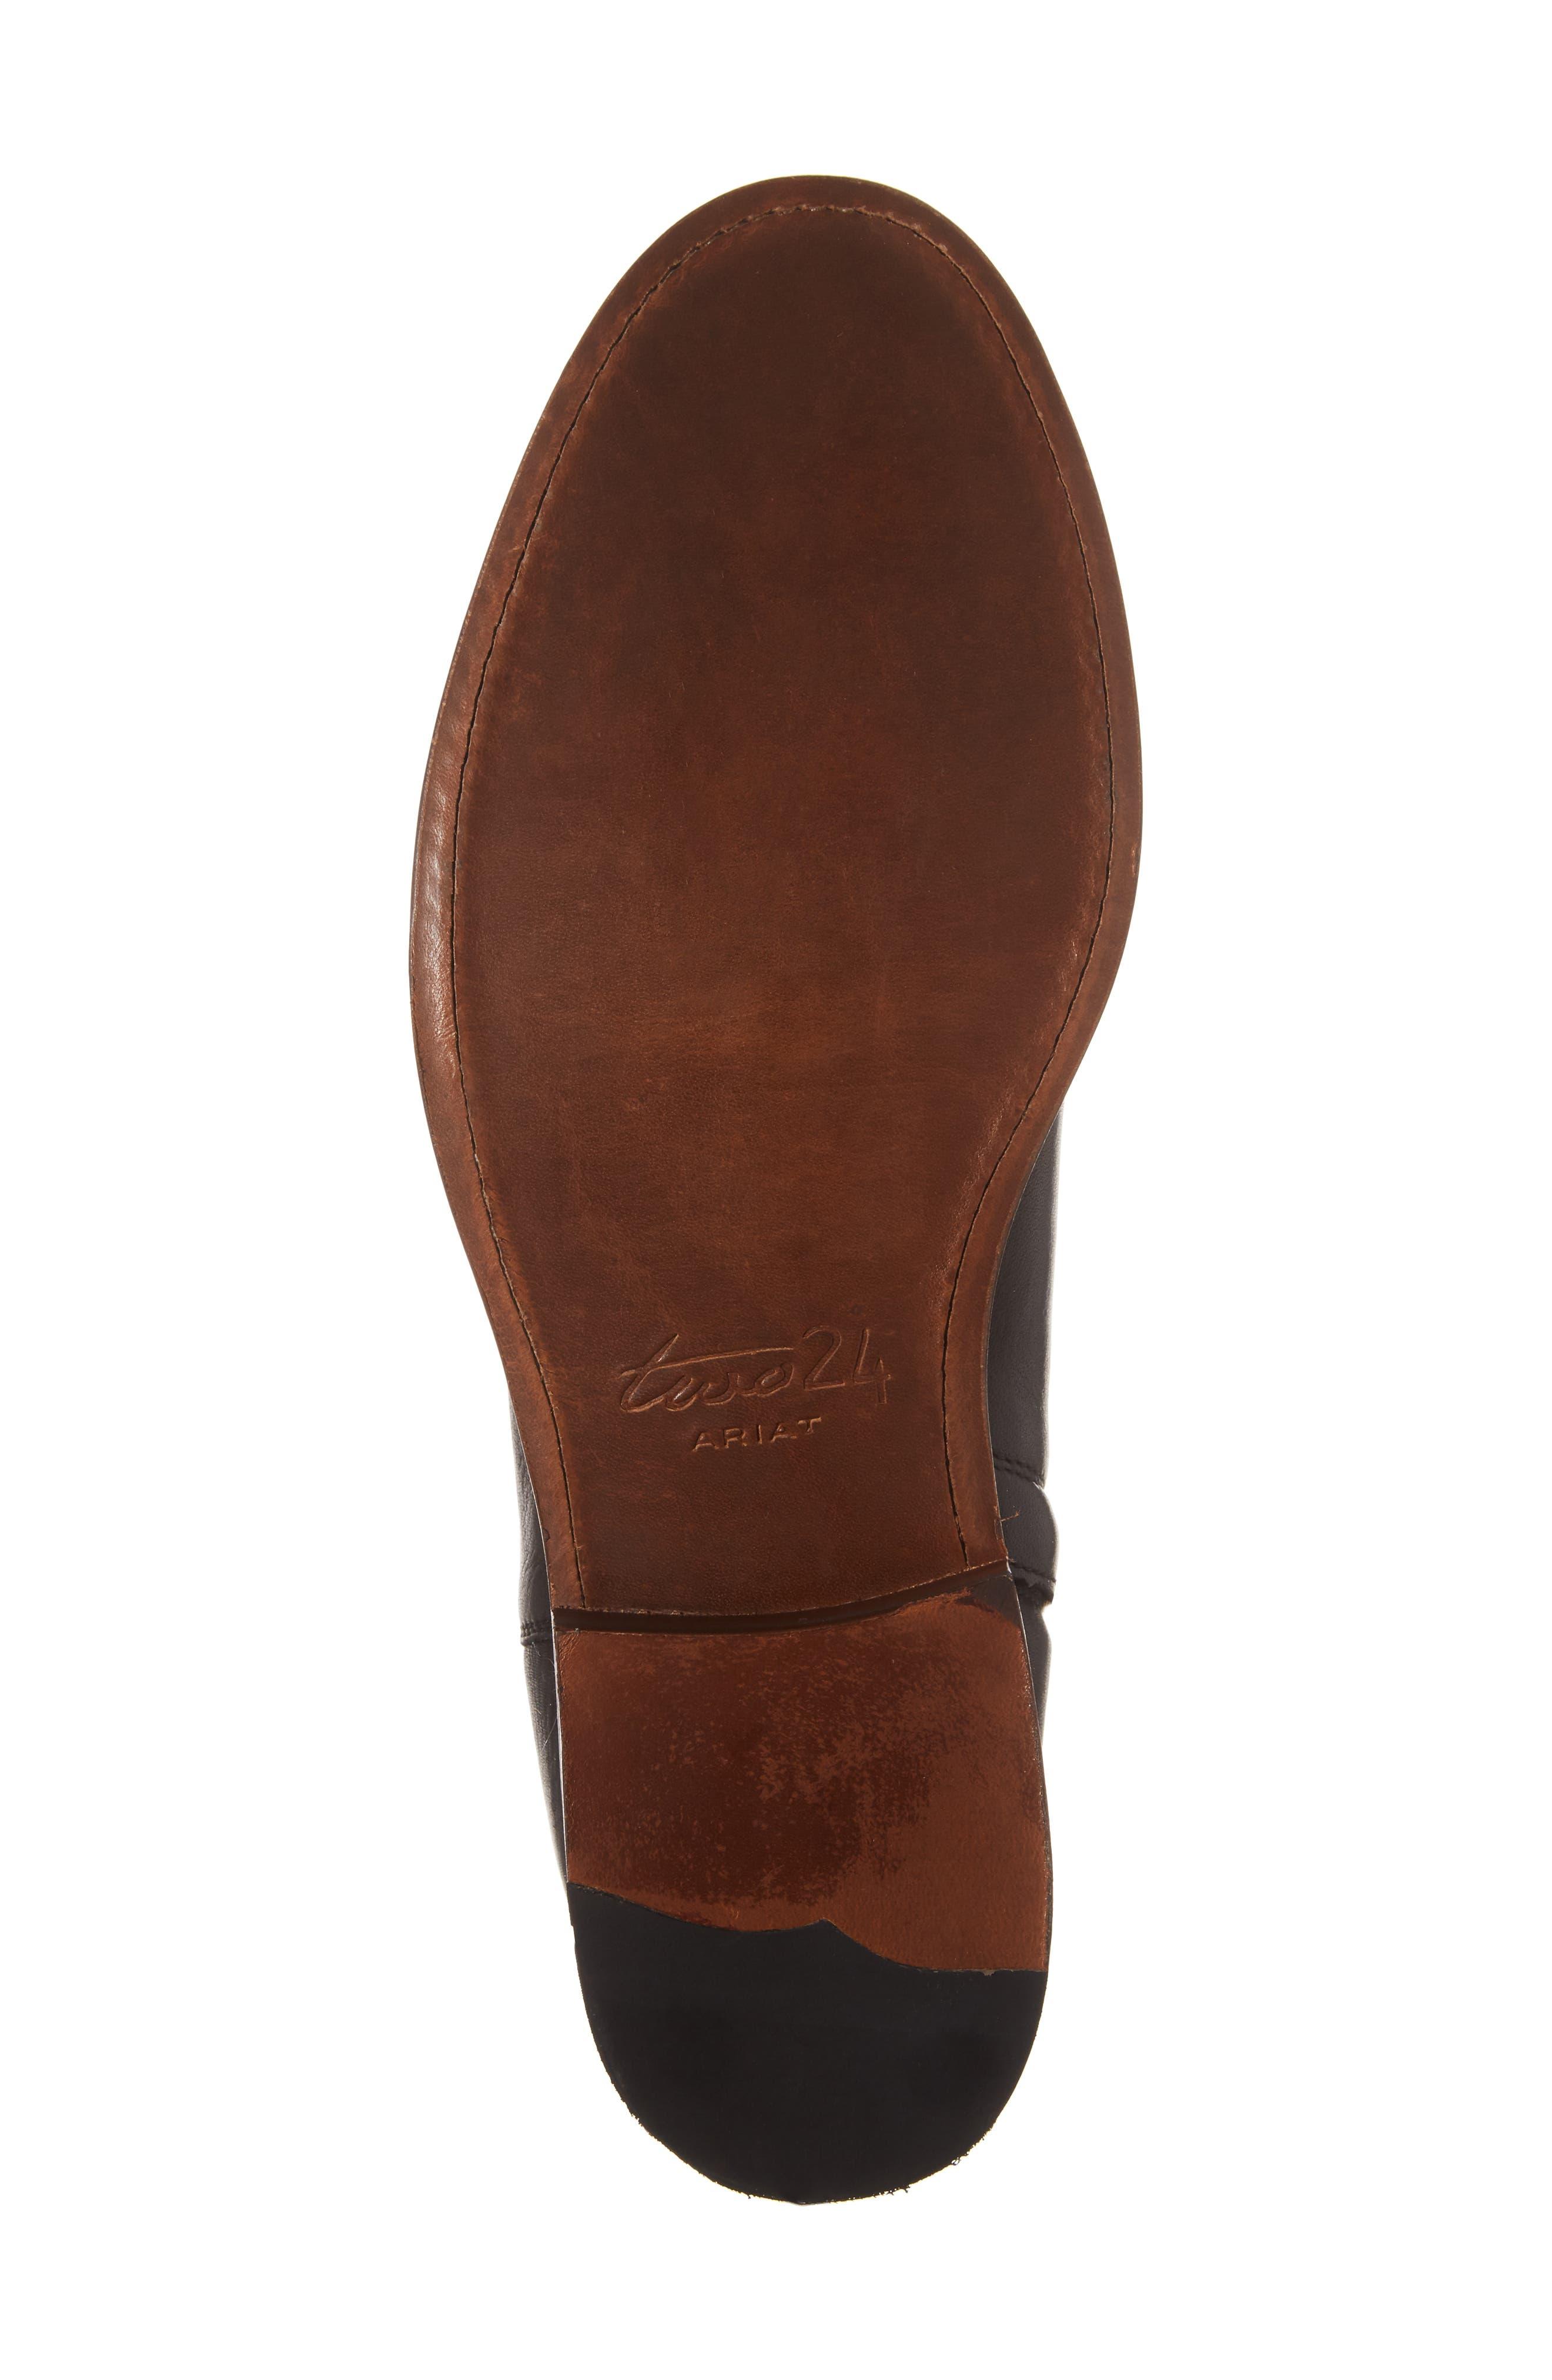 Ariat Santa Fe Mid Zip Boot,                             Alternate thumbnail 6, color,                             001